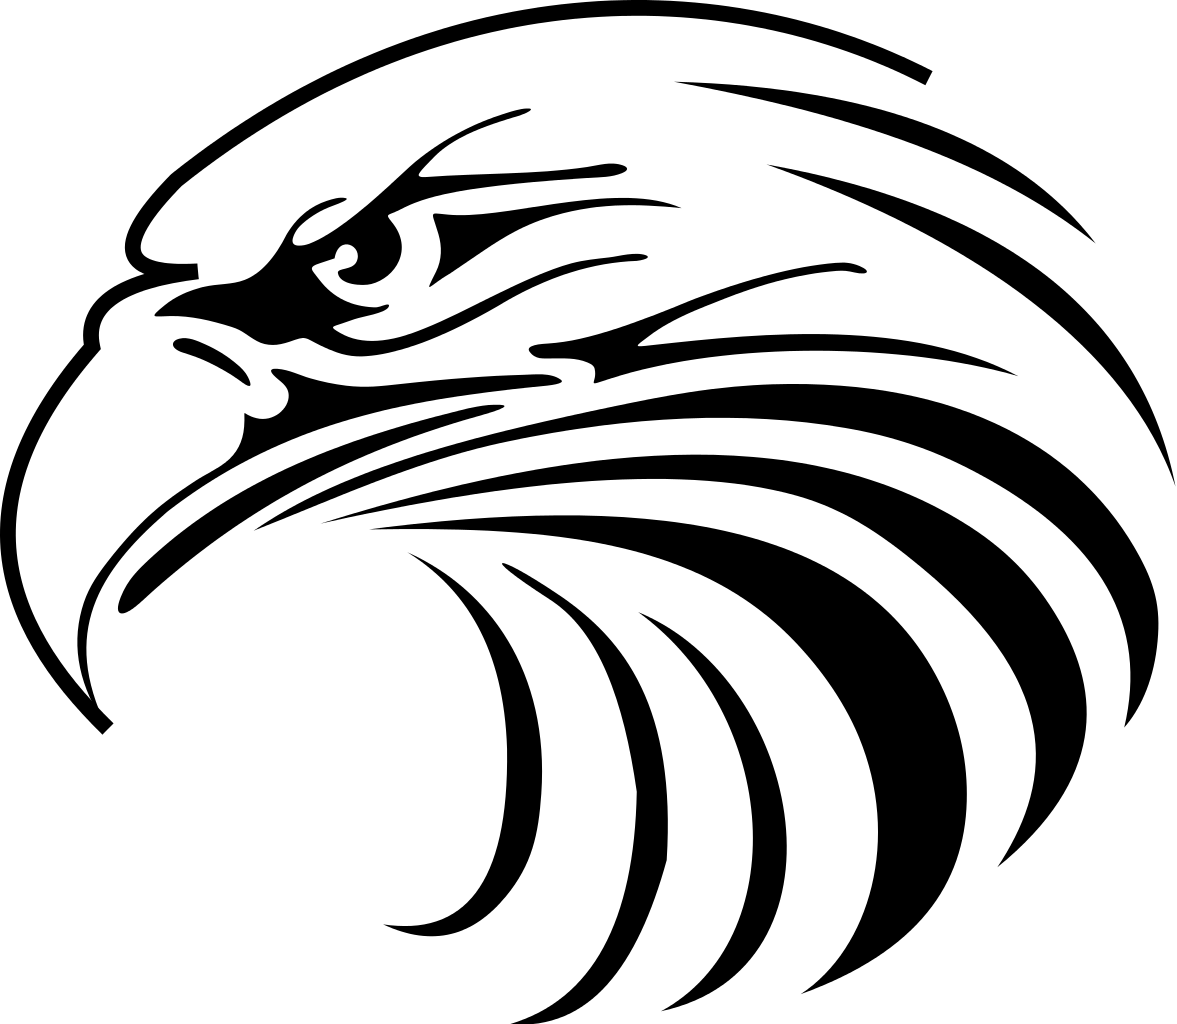 1177x1024 Fileeagle Head Vector Image.svg